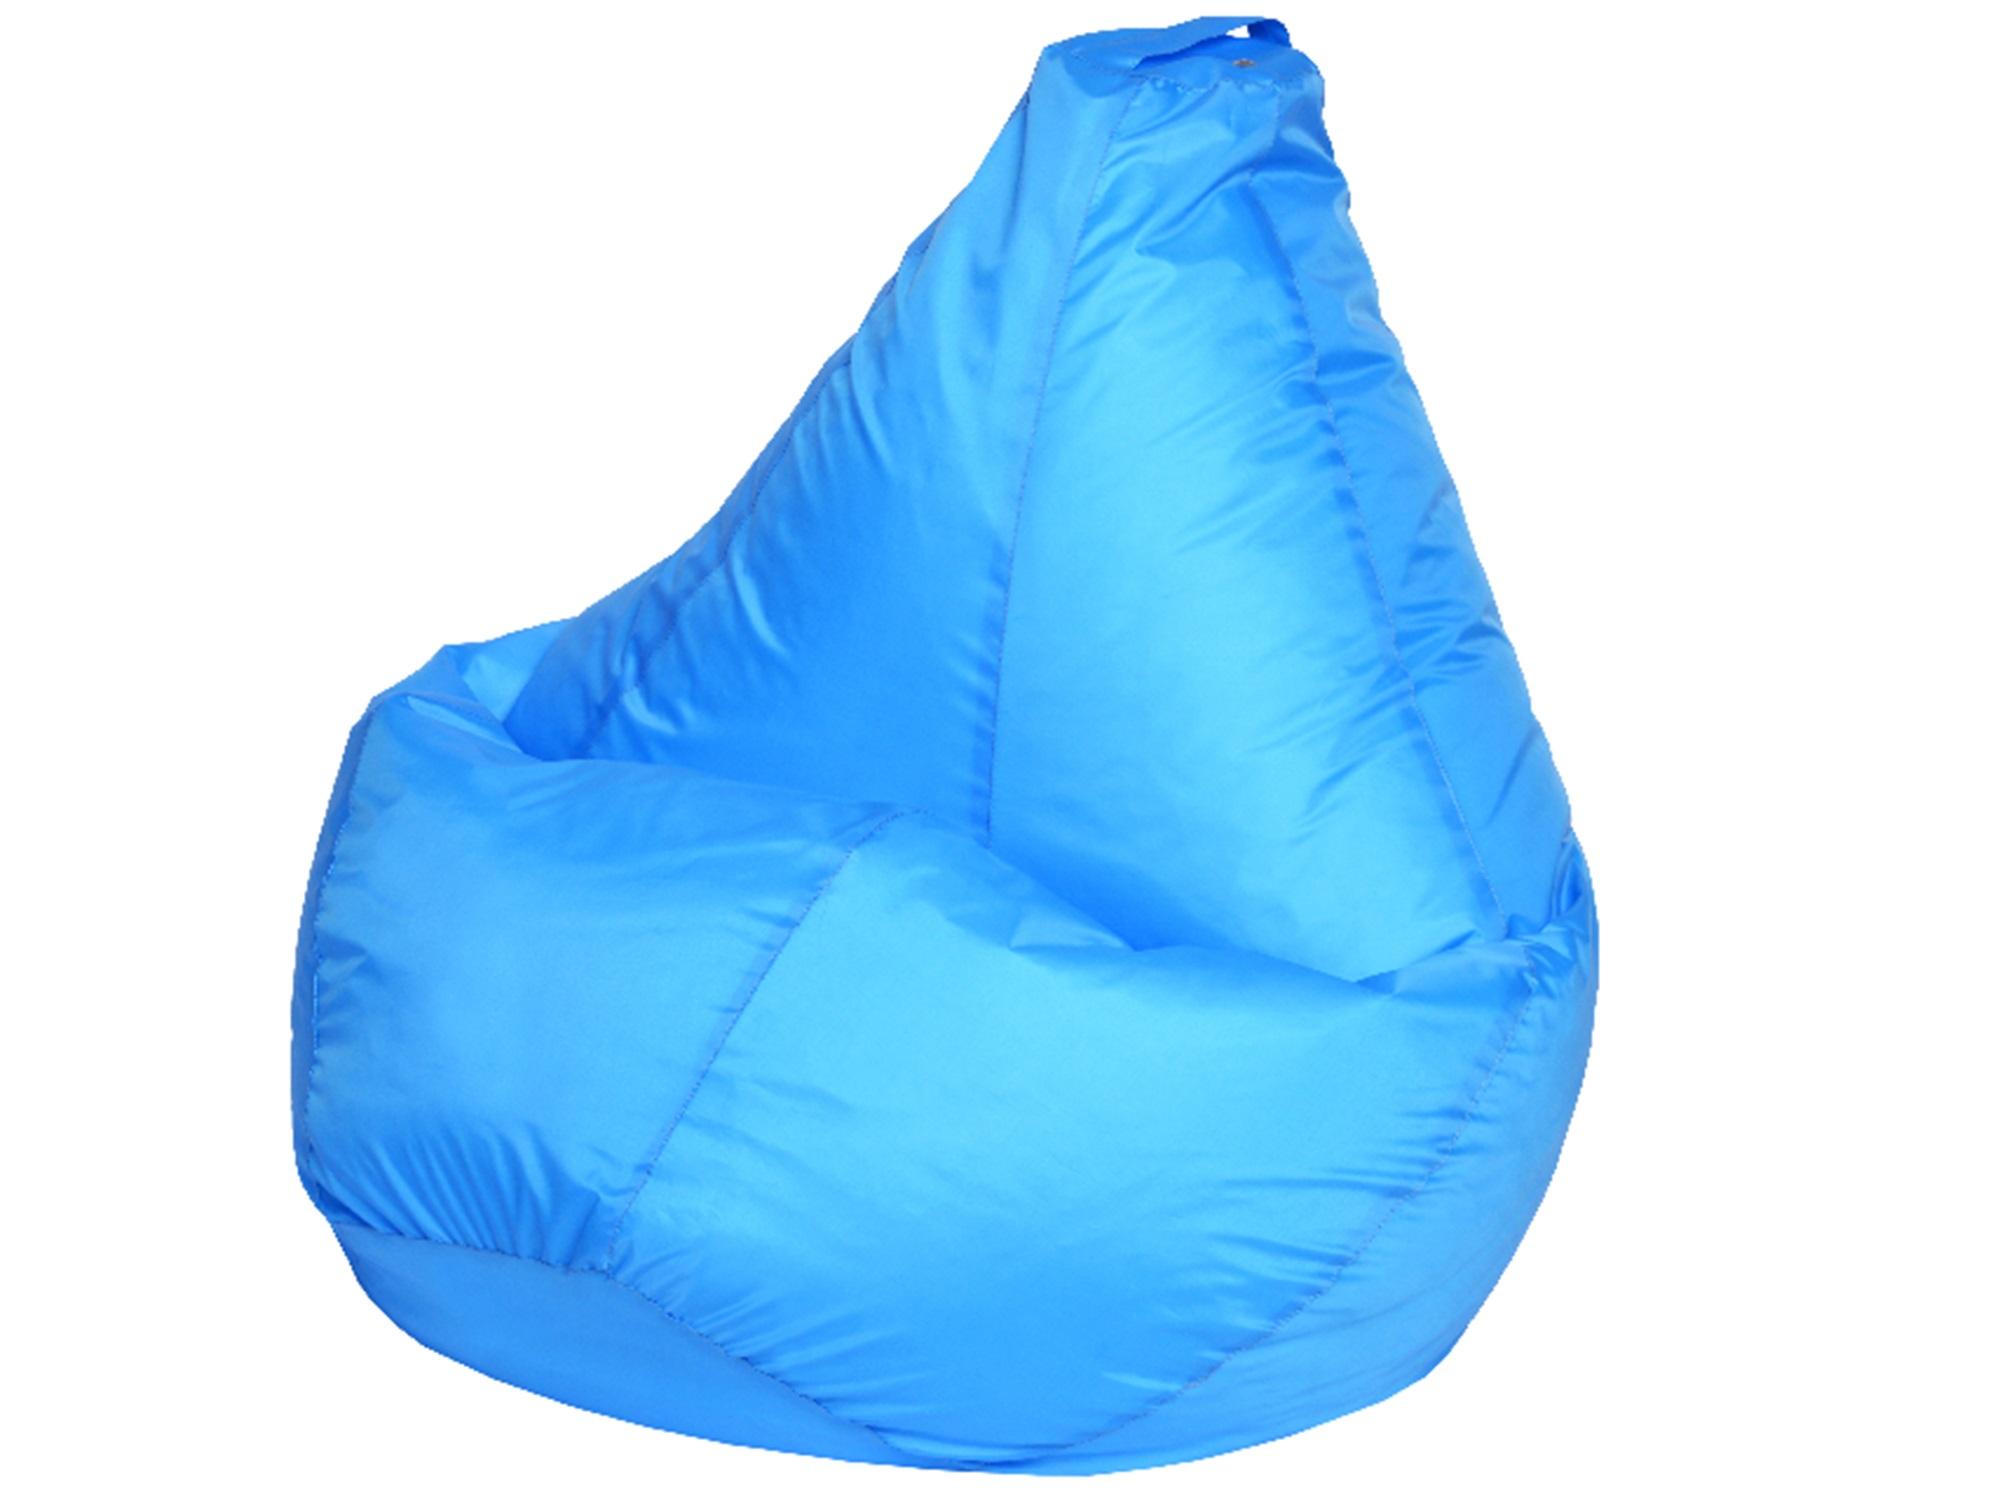 Кресло Мешок Голубое Оксфорд XL 125х85 MebelVia , Голубой, Оксфорд кресло мешок флаги xl 125х85 mebelvia